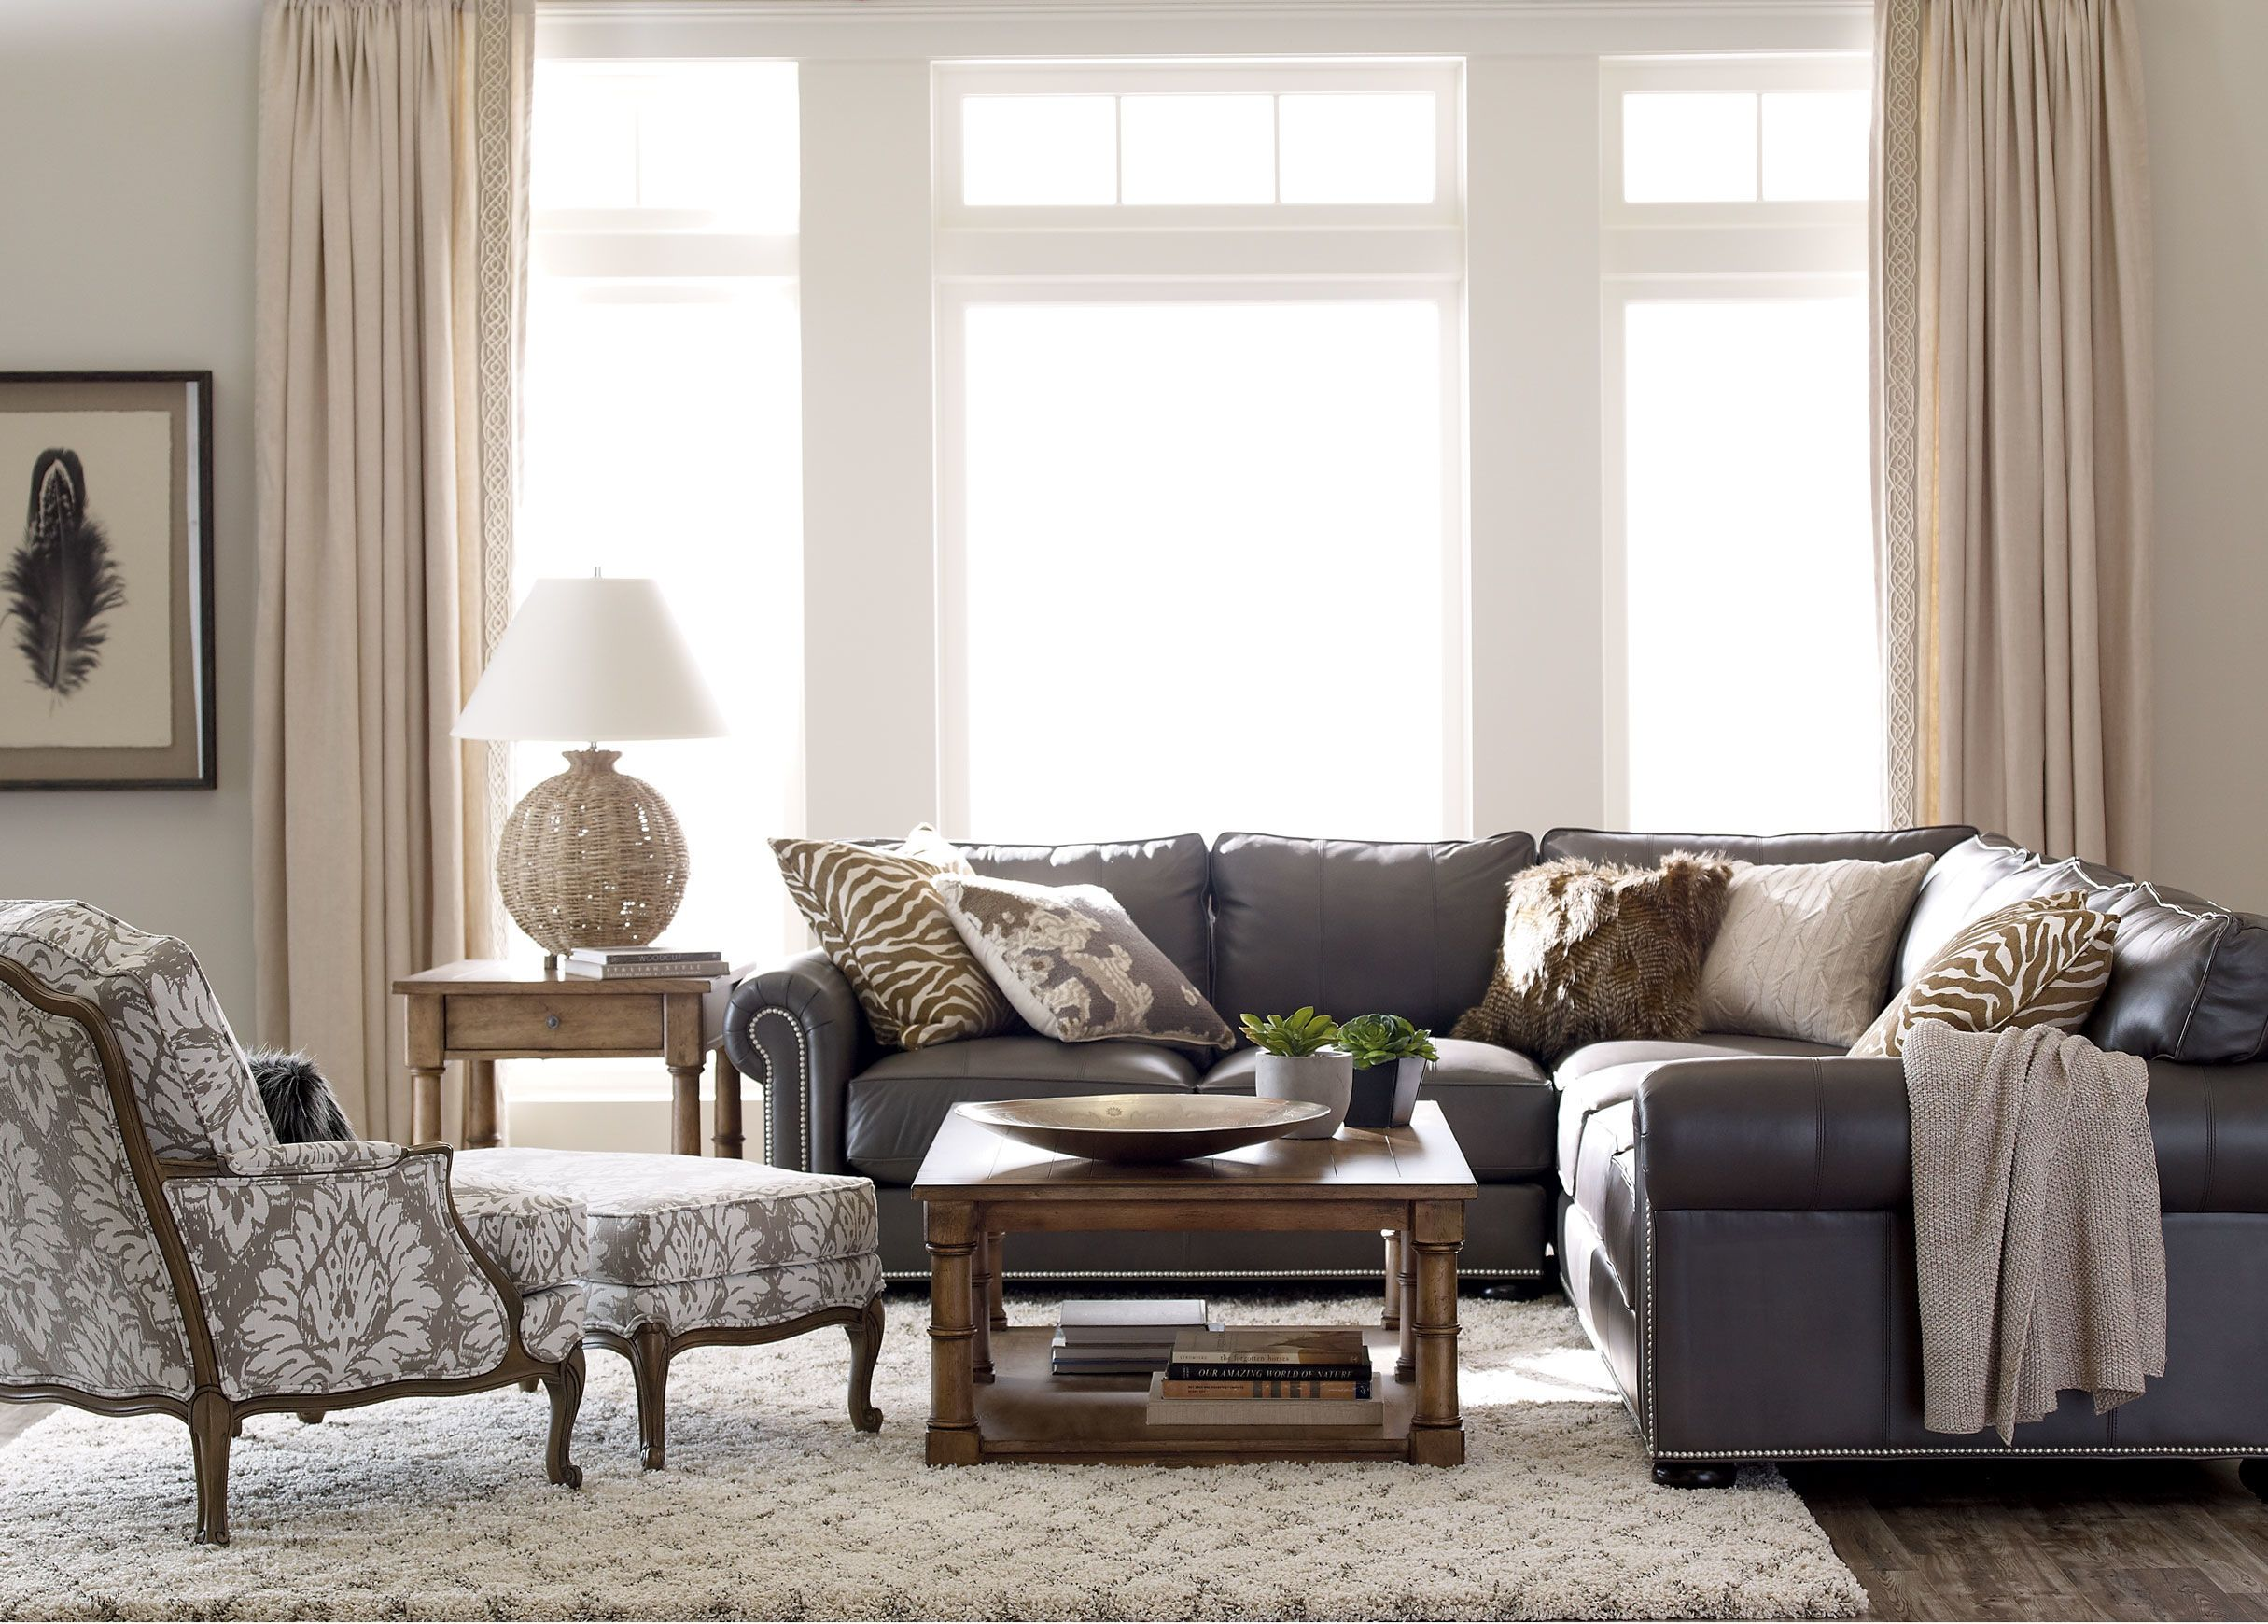 Seagrass Table Lamp | design details ...3 | Pinterest | Living rooms ...